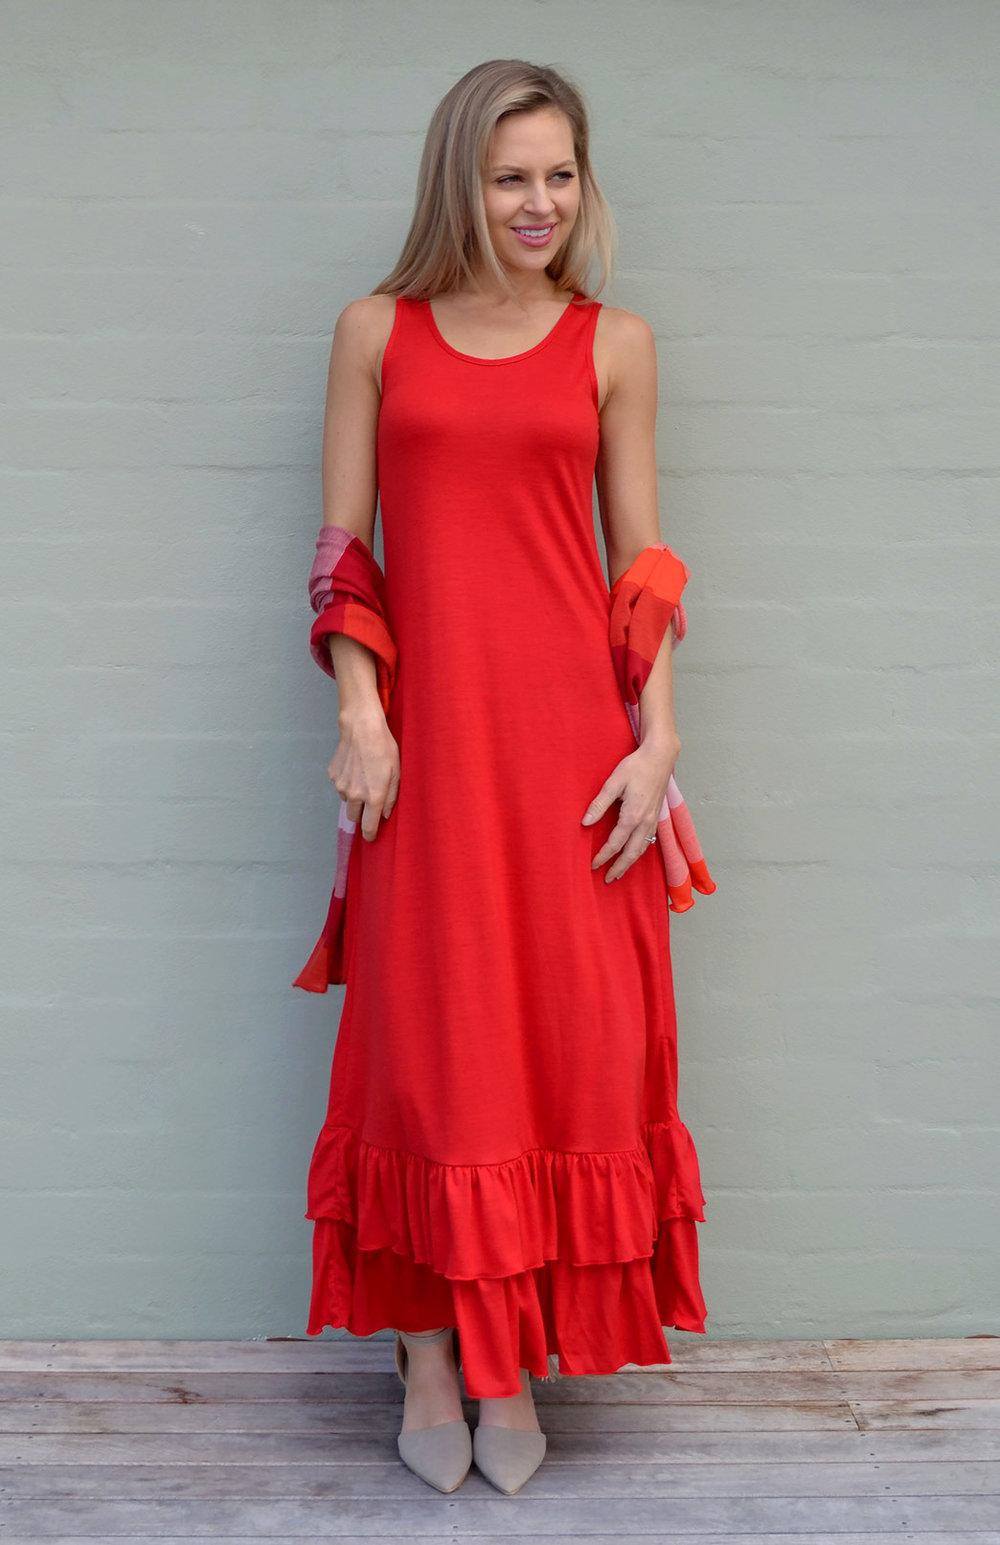 8546-sofia-dress-infra-red-0.jpg